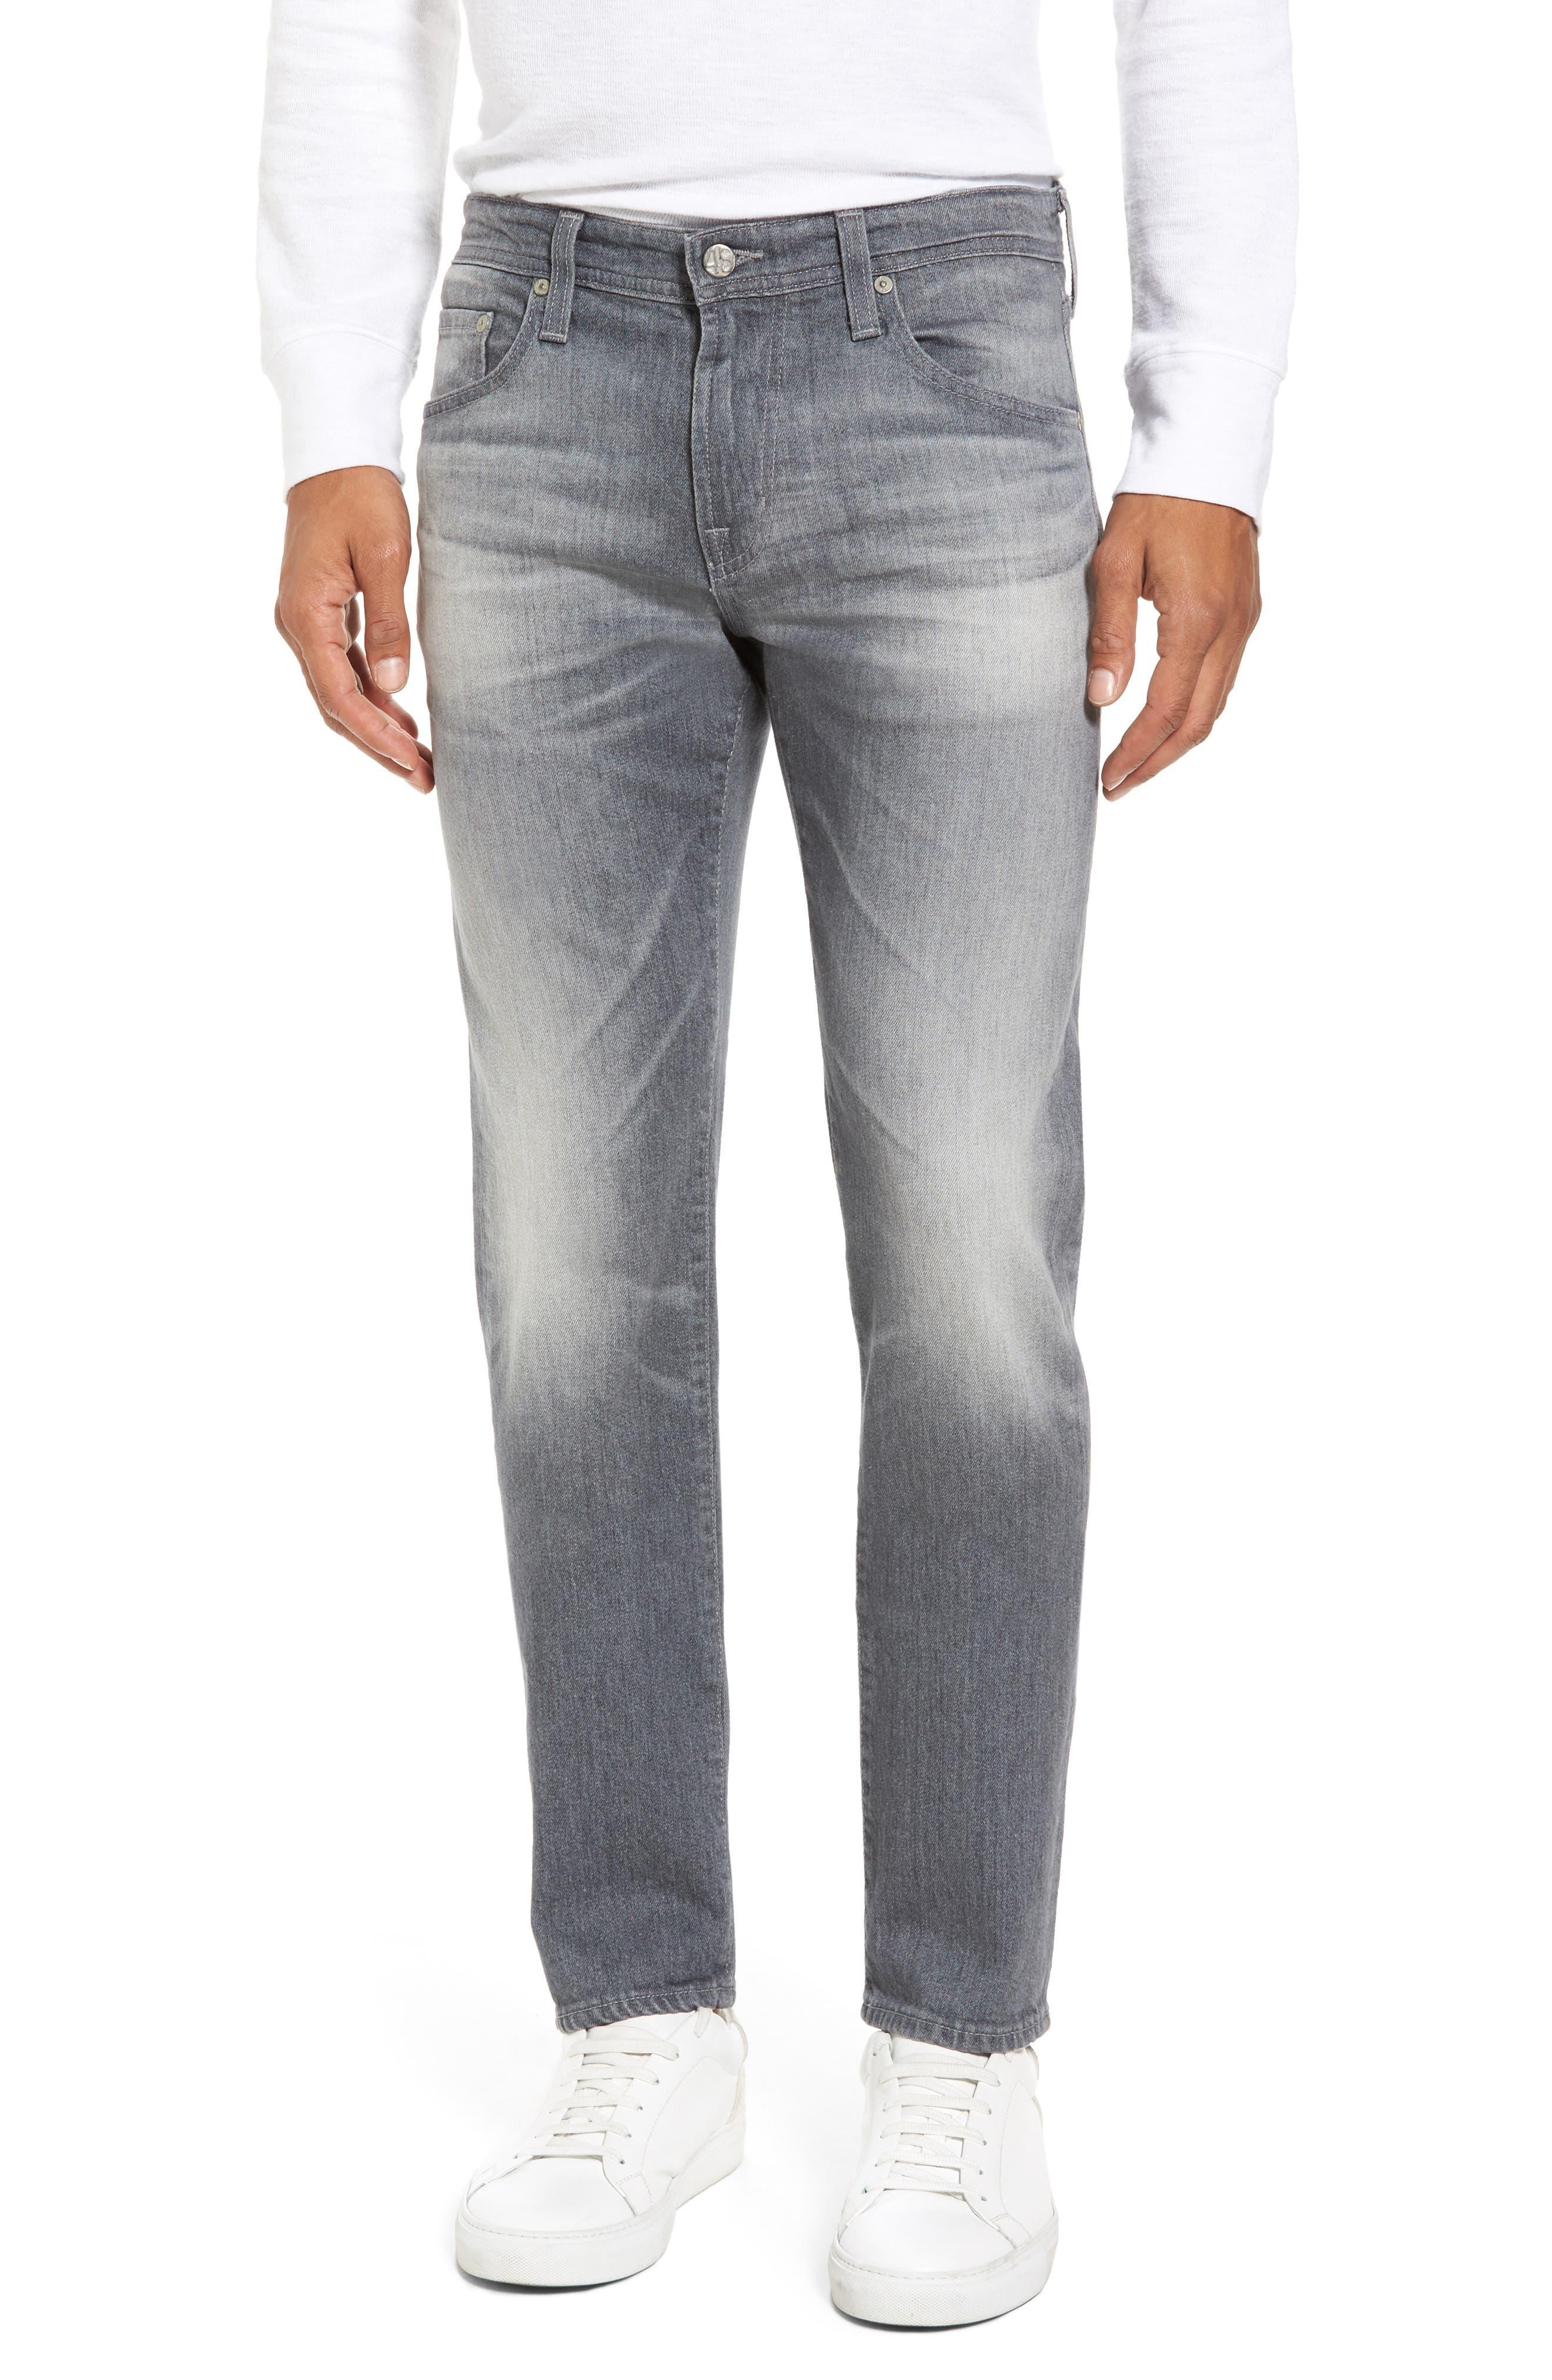 Tellis Modern Slim Fit Jeans,                         Main,                         color, 020